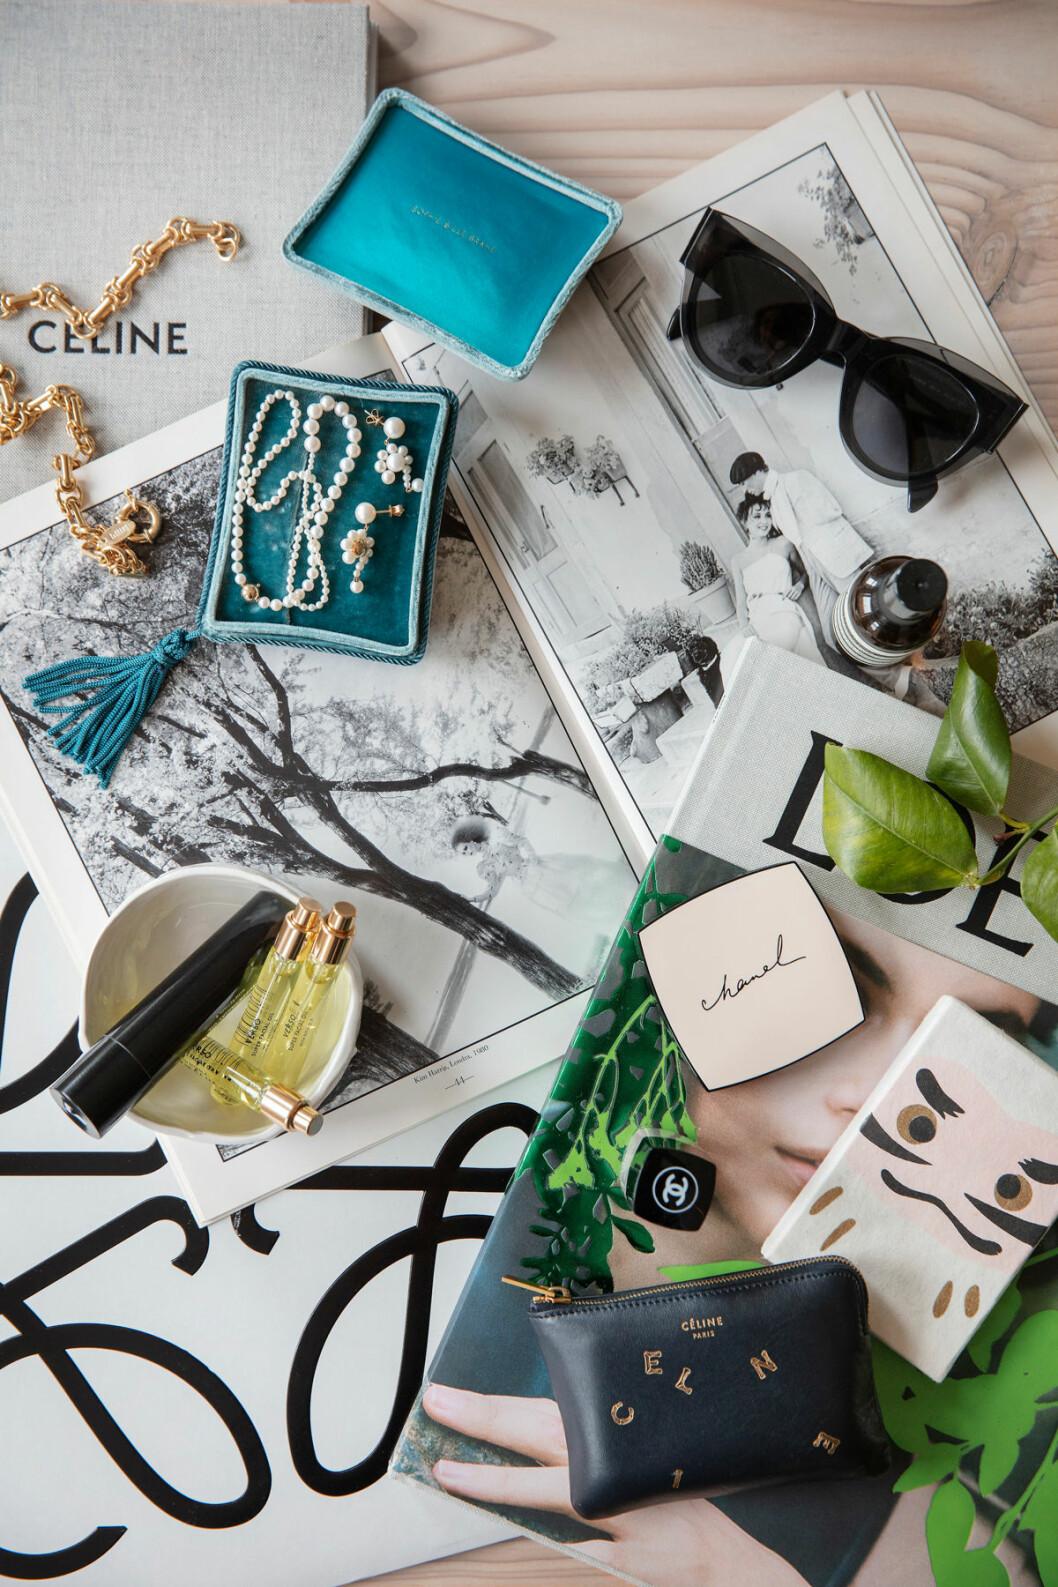 Hemma hos Josephine smycken invitations Elle decoration